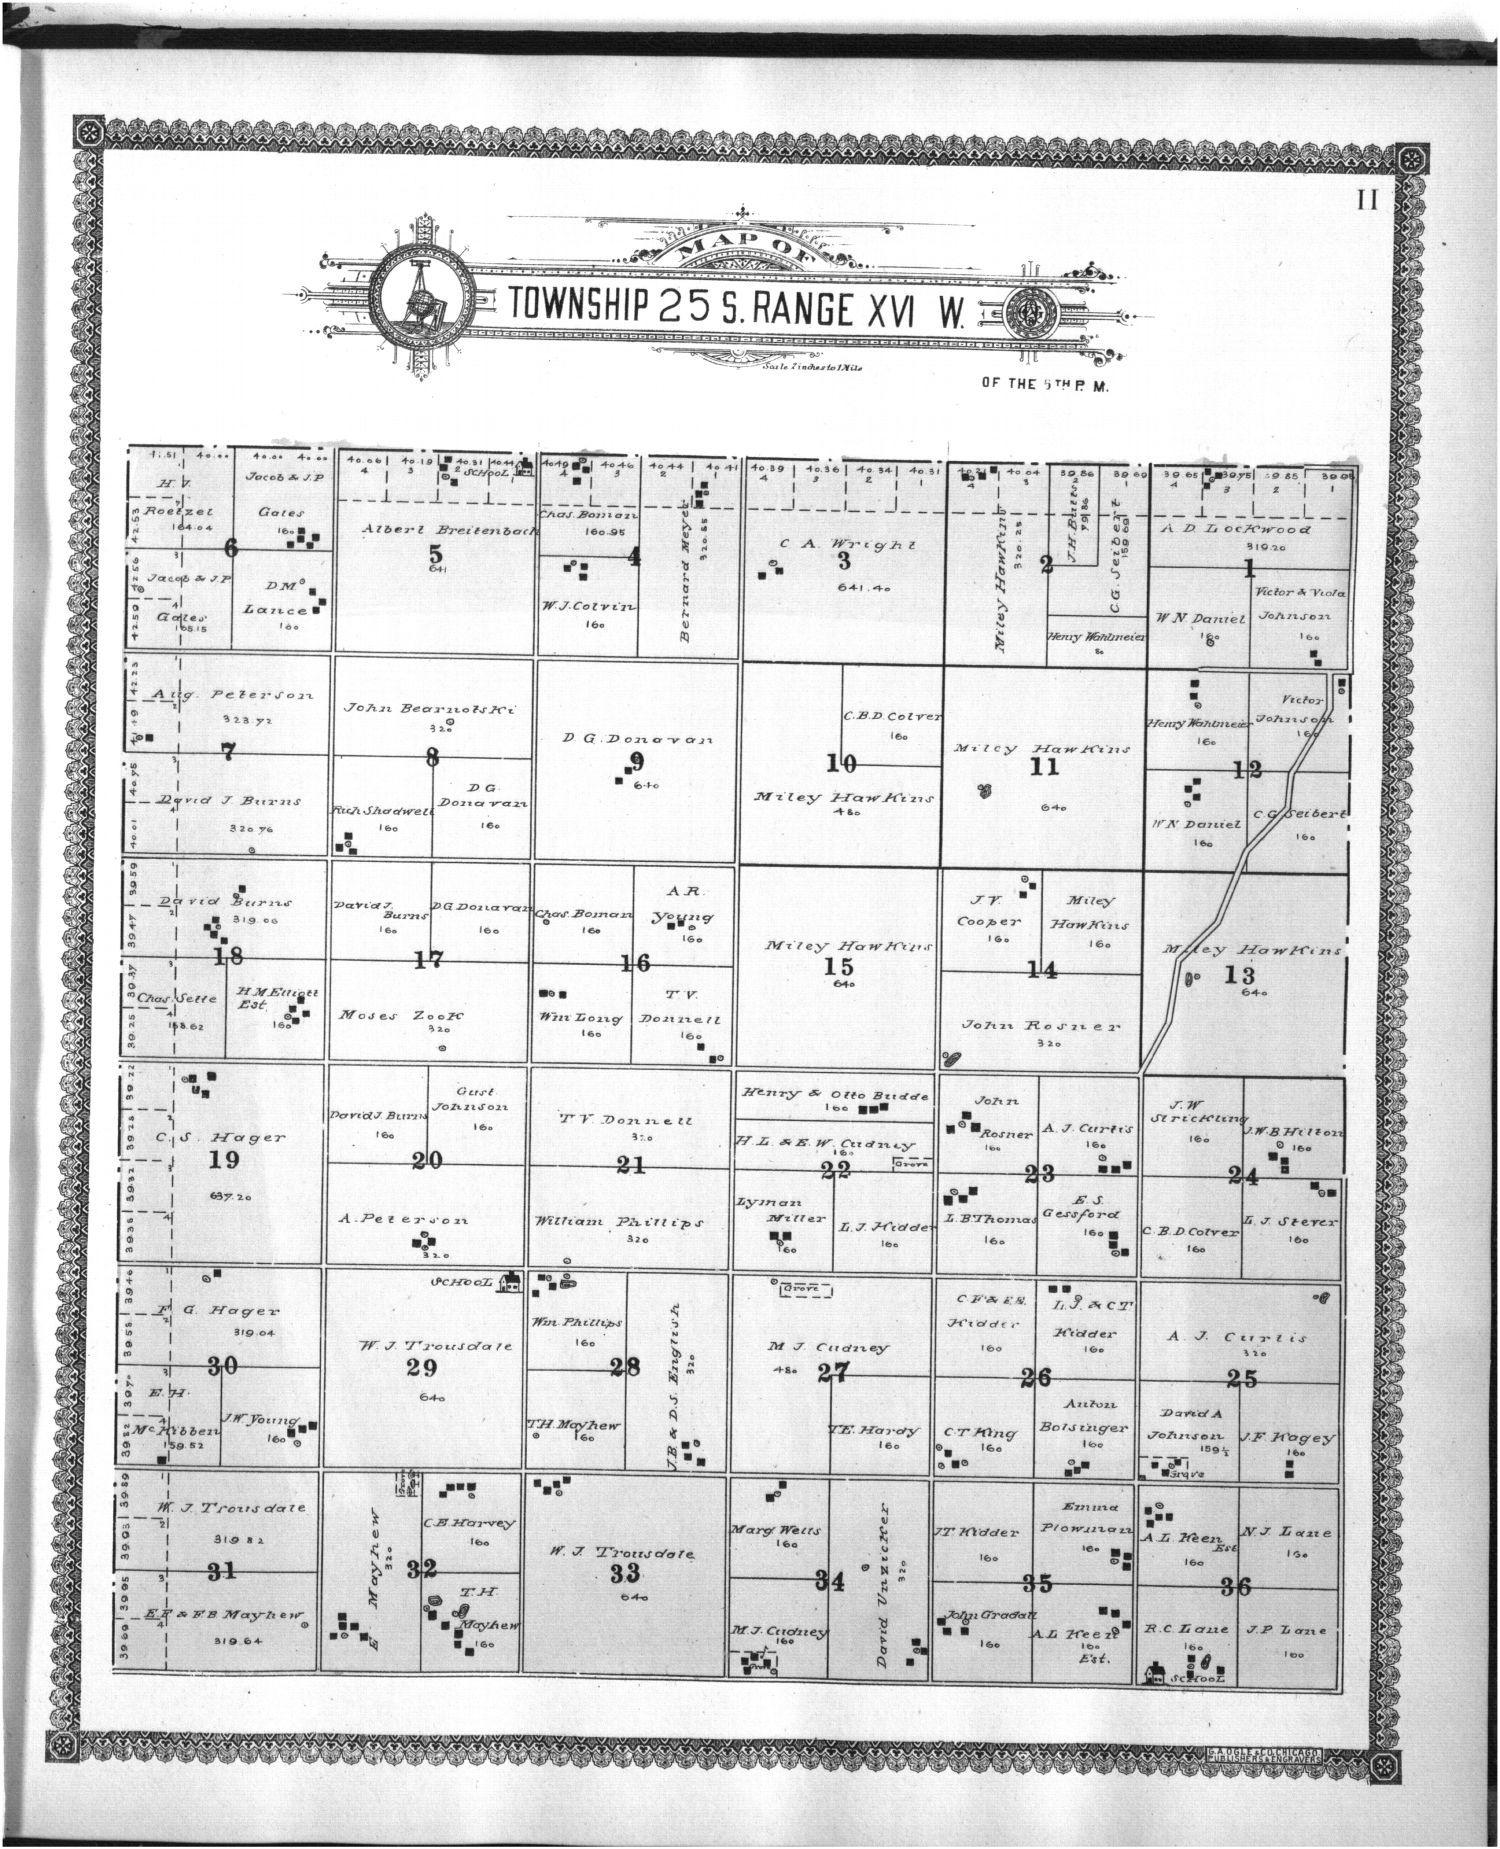 Standard atlas of Edwards County - 11